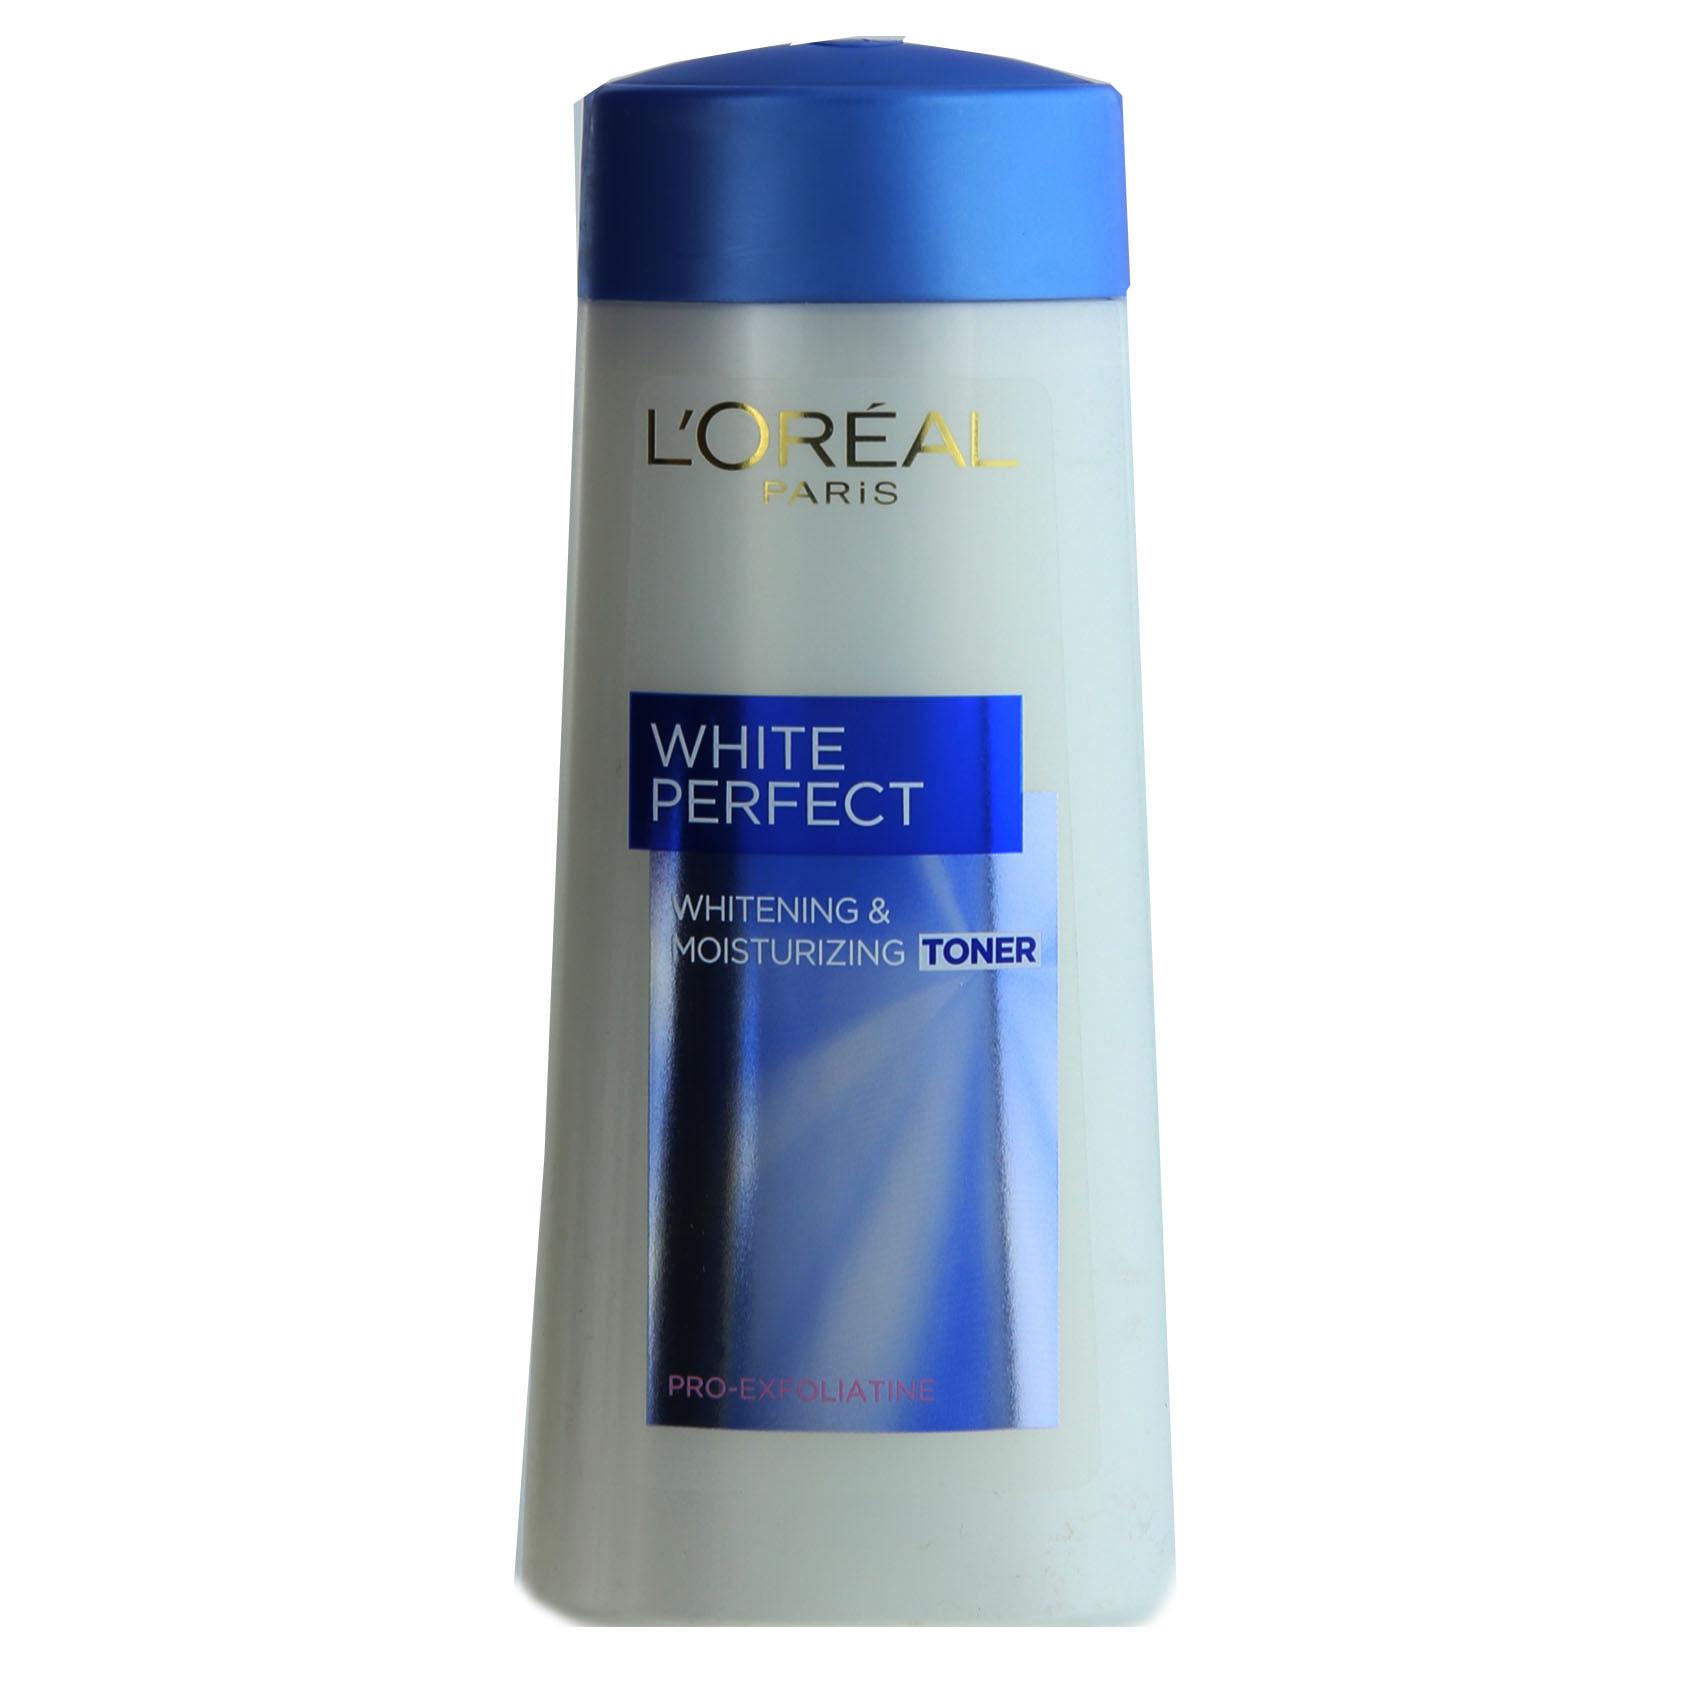 L'OREAL DERMO-EXP W/PERF TONER200ML